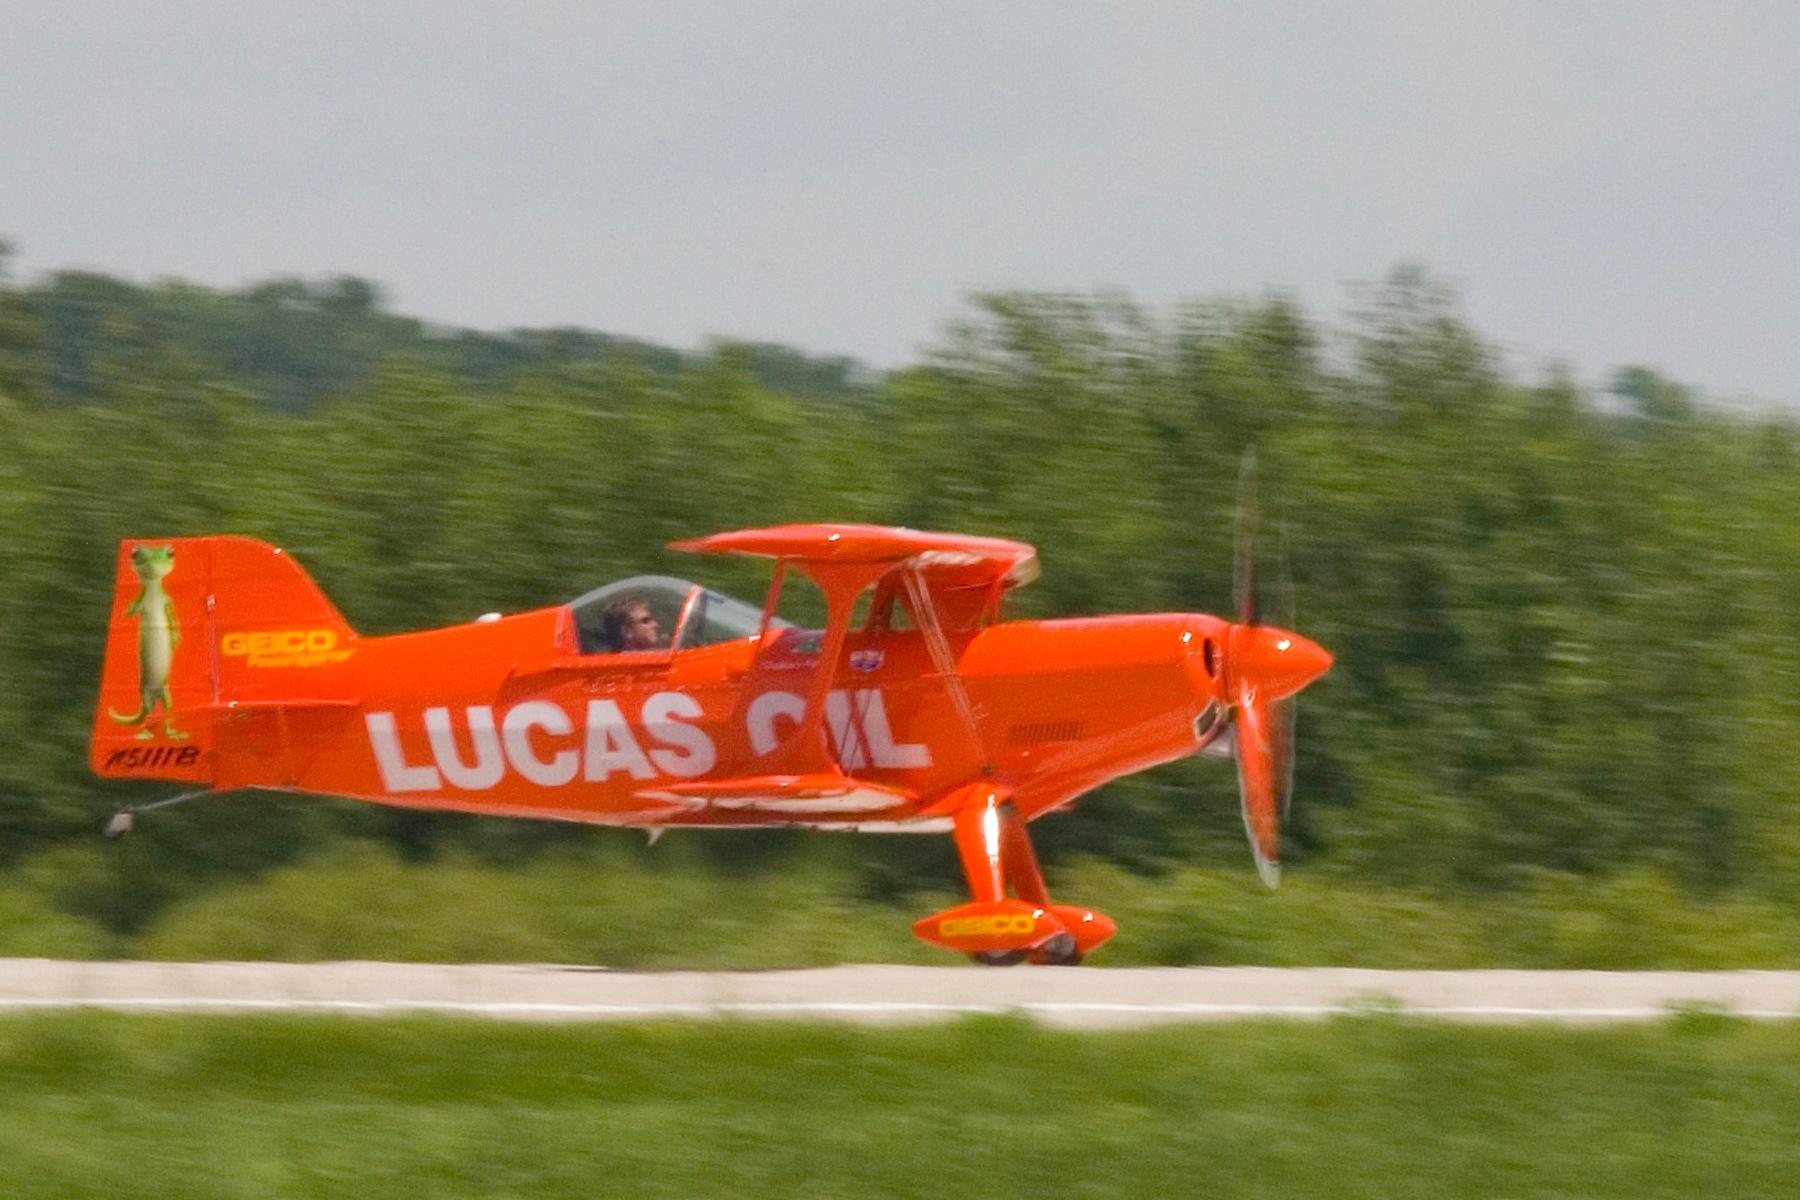 Lucas oil biplane skimming the runway by Bernard Mordorski